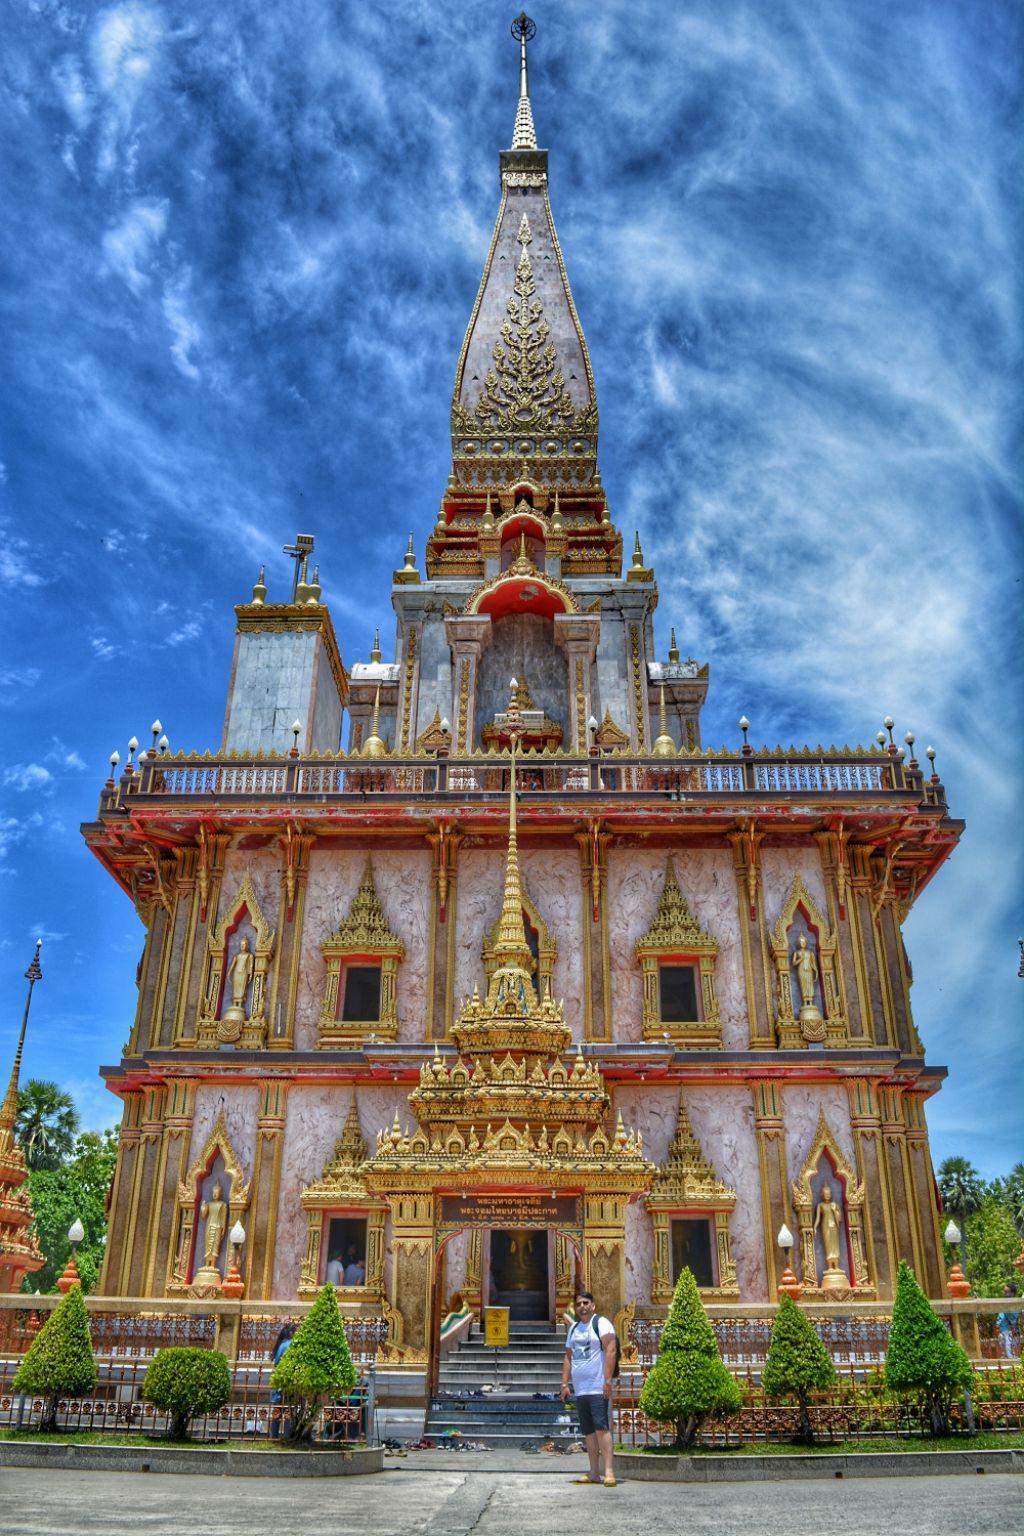 Photo of Wat Chalong Temple By Shalini Sharma